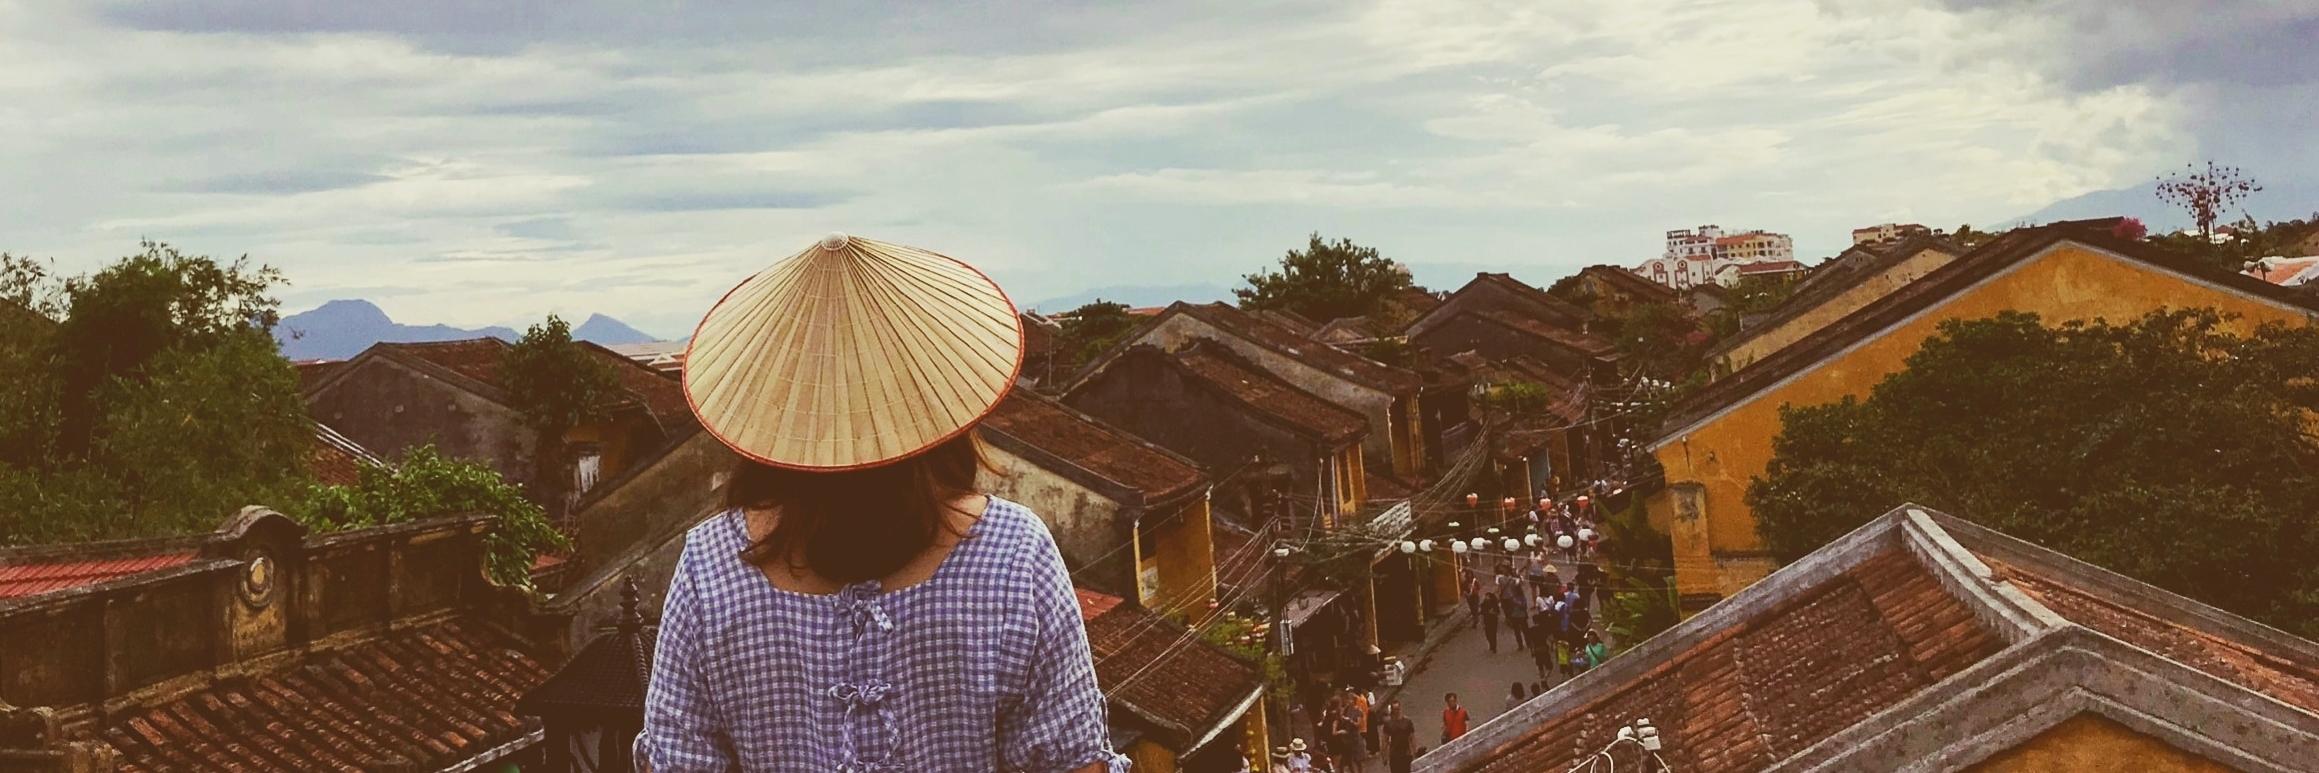 https://gody.vn/blog/nganha31519932497/post/mot-ngay-lang-thang-o-hoi-an-1817